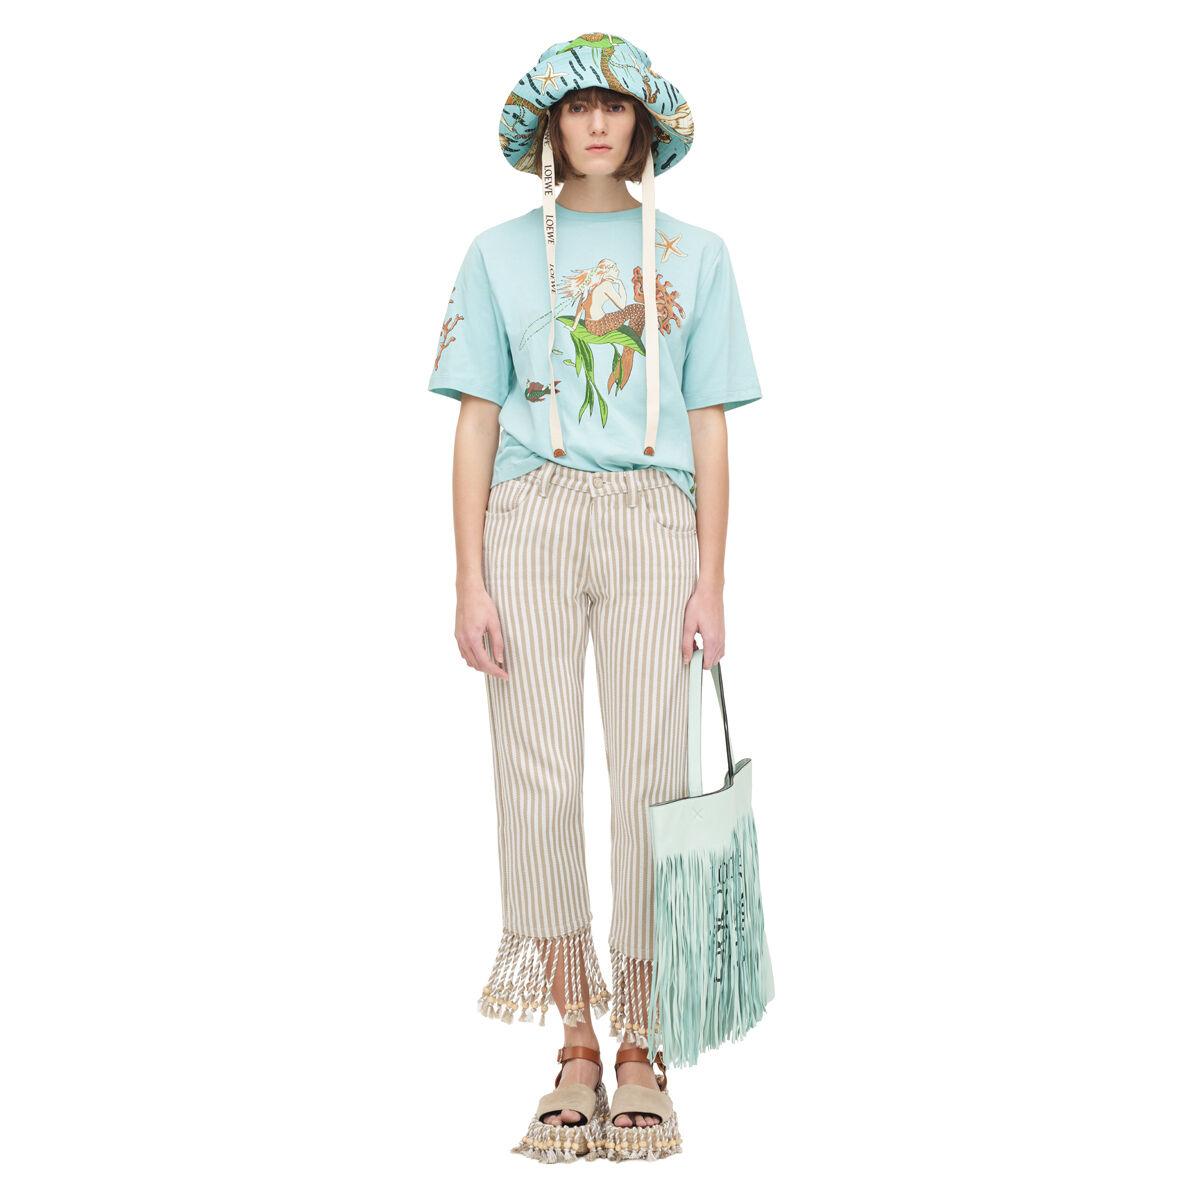 Blue Paulas Ibiza Edition Mermaid Fringe T-Shirt Loewe Sale Explore ifKZGk88W